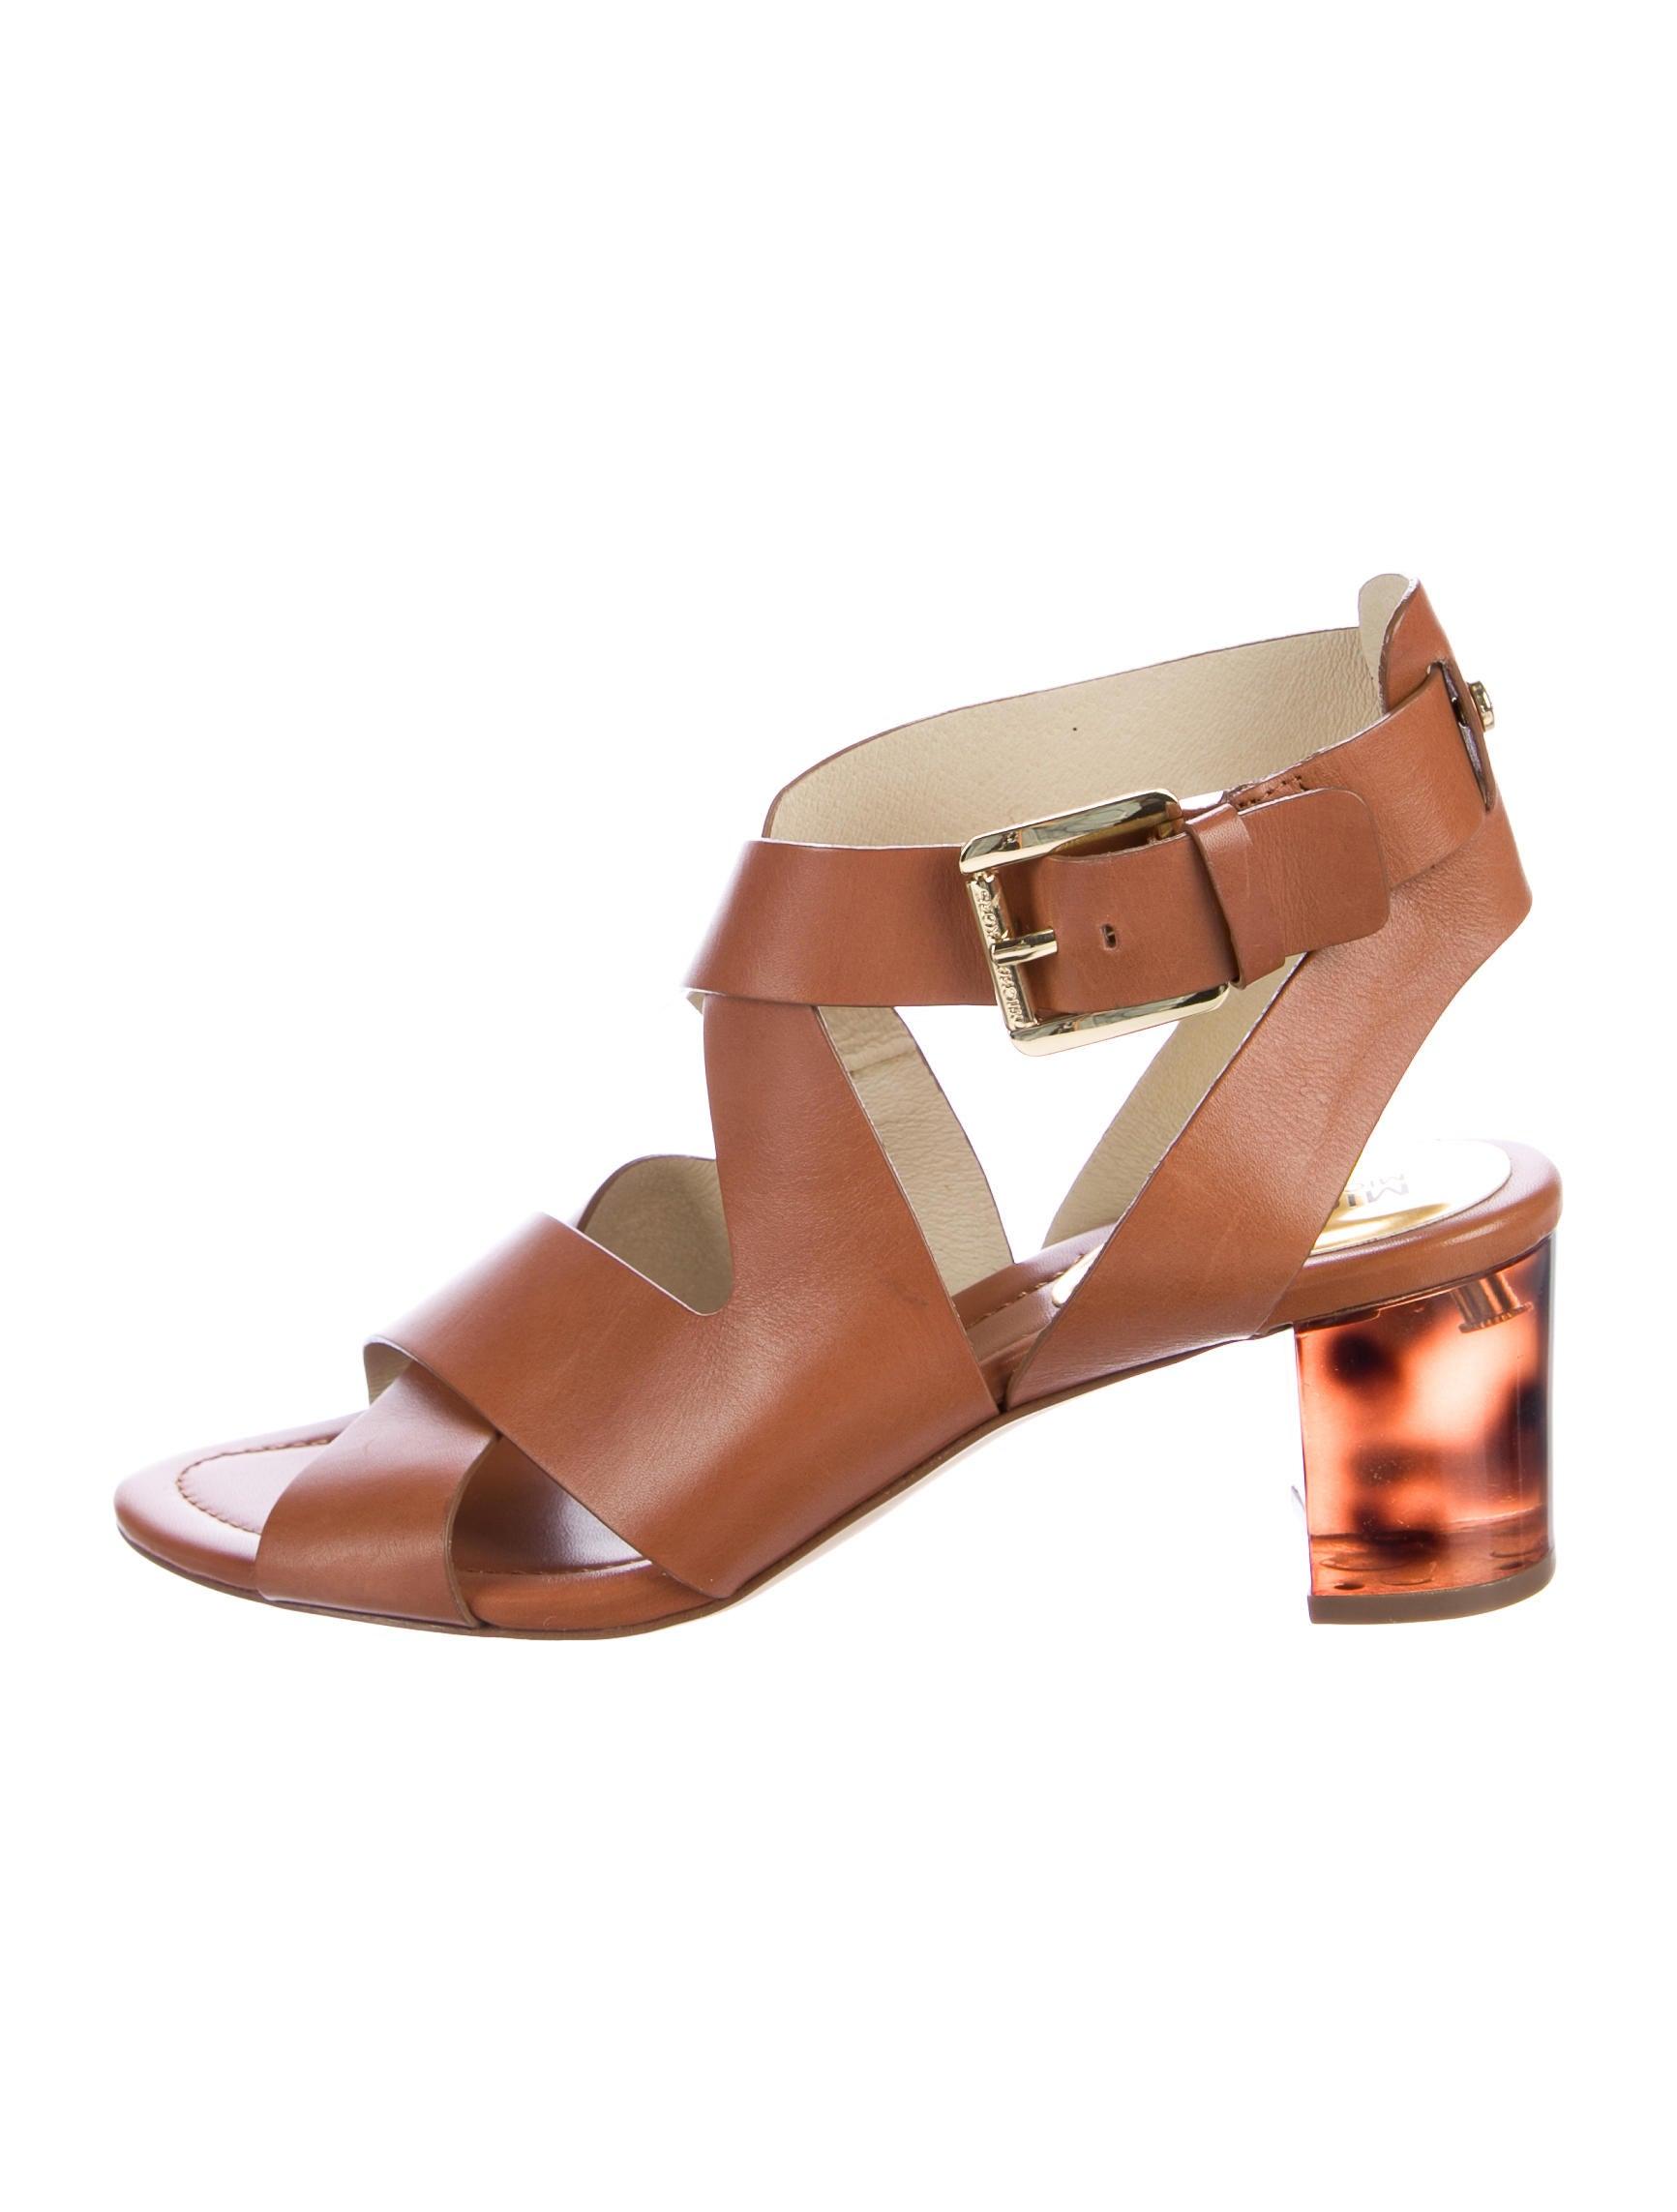 Michael Kors Sandals And Shoes Sale